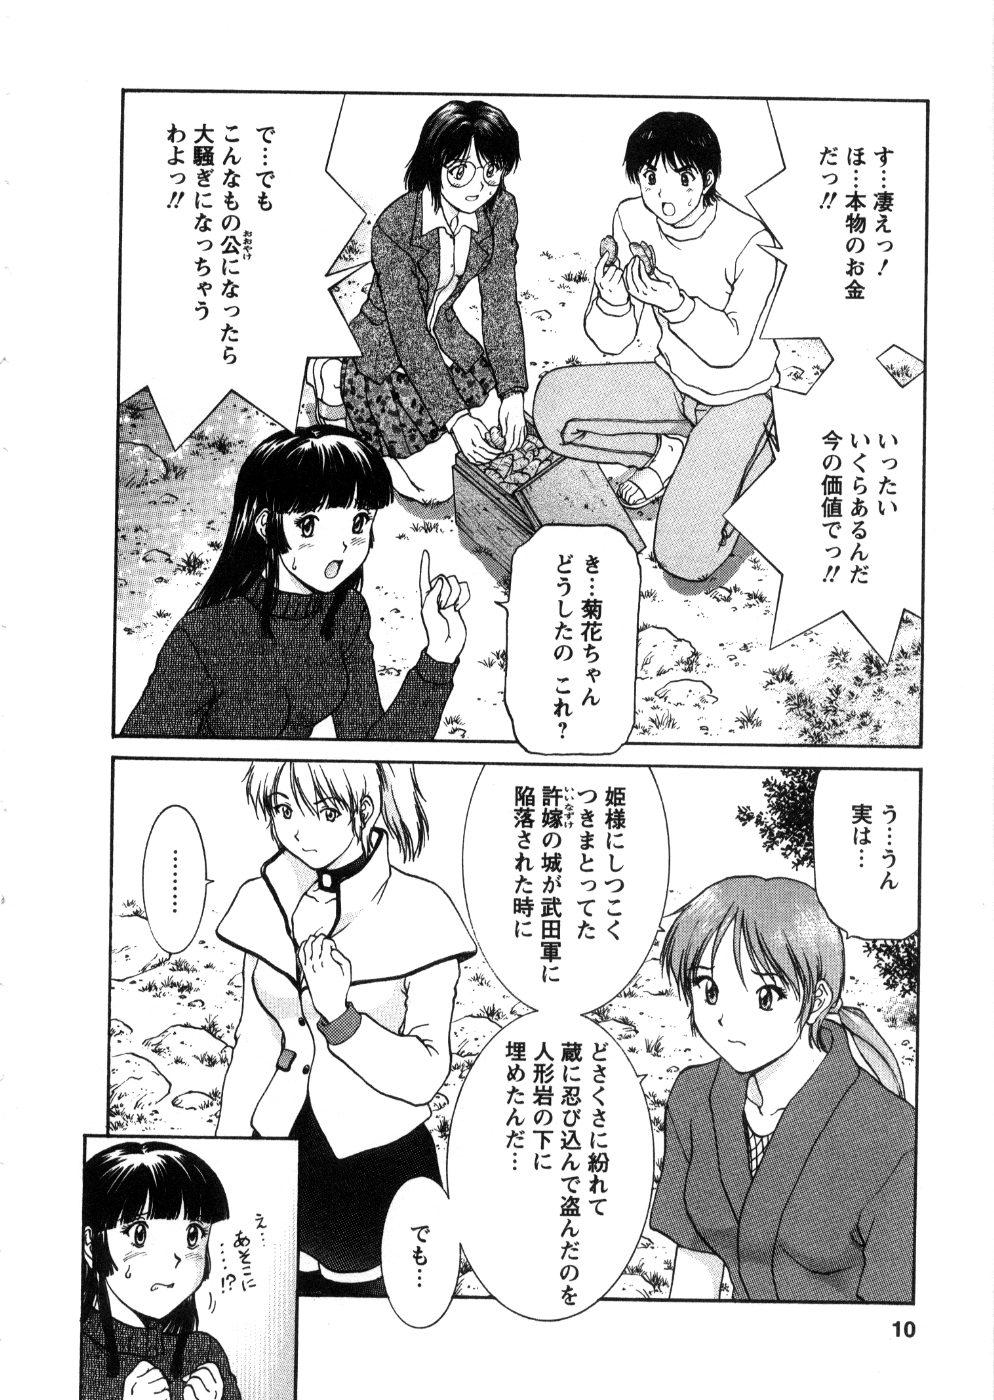 Oneechan-tachi ga Yatte Kuru 03 11